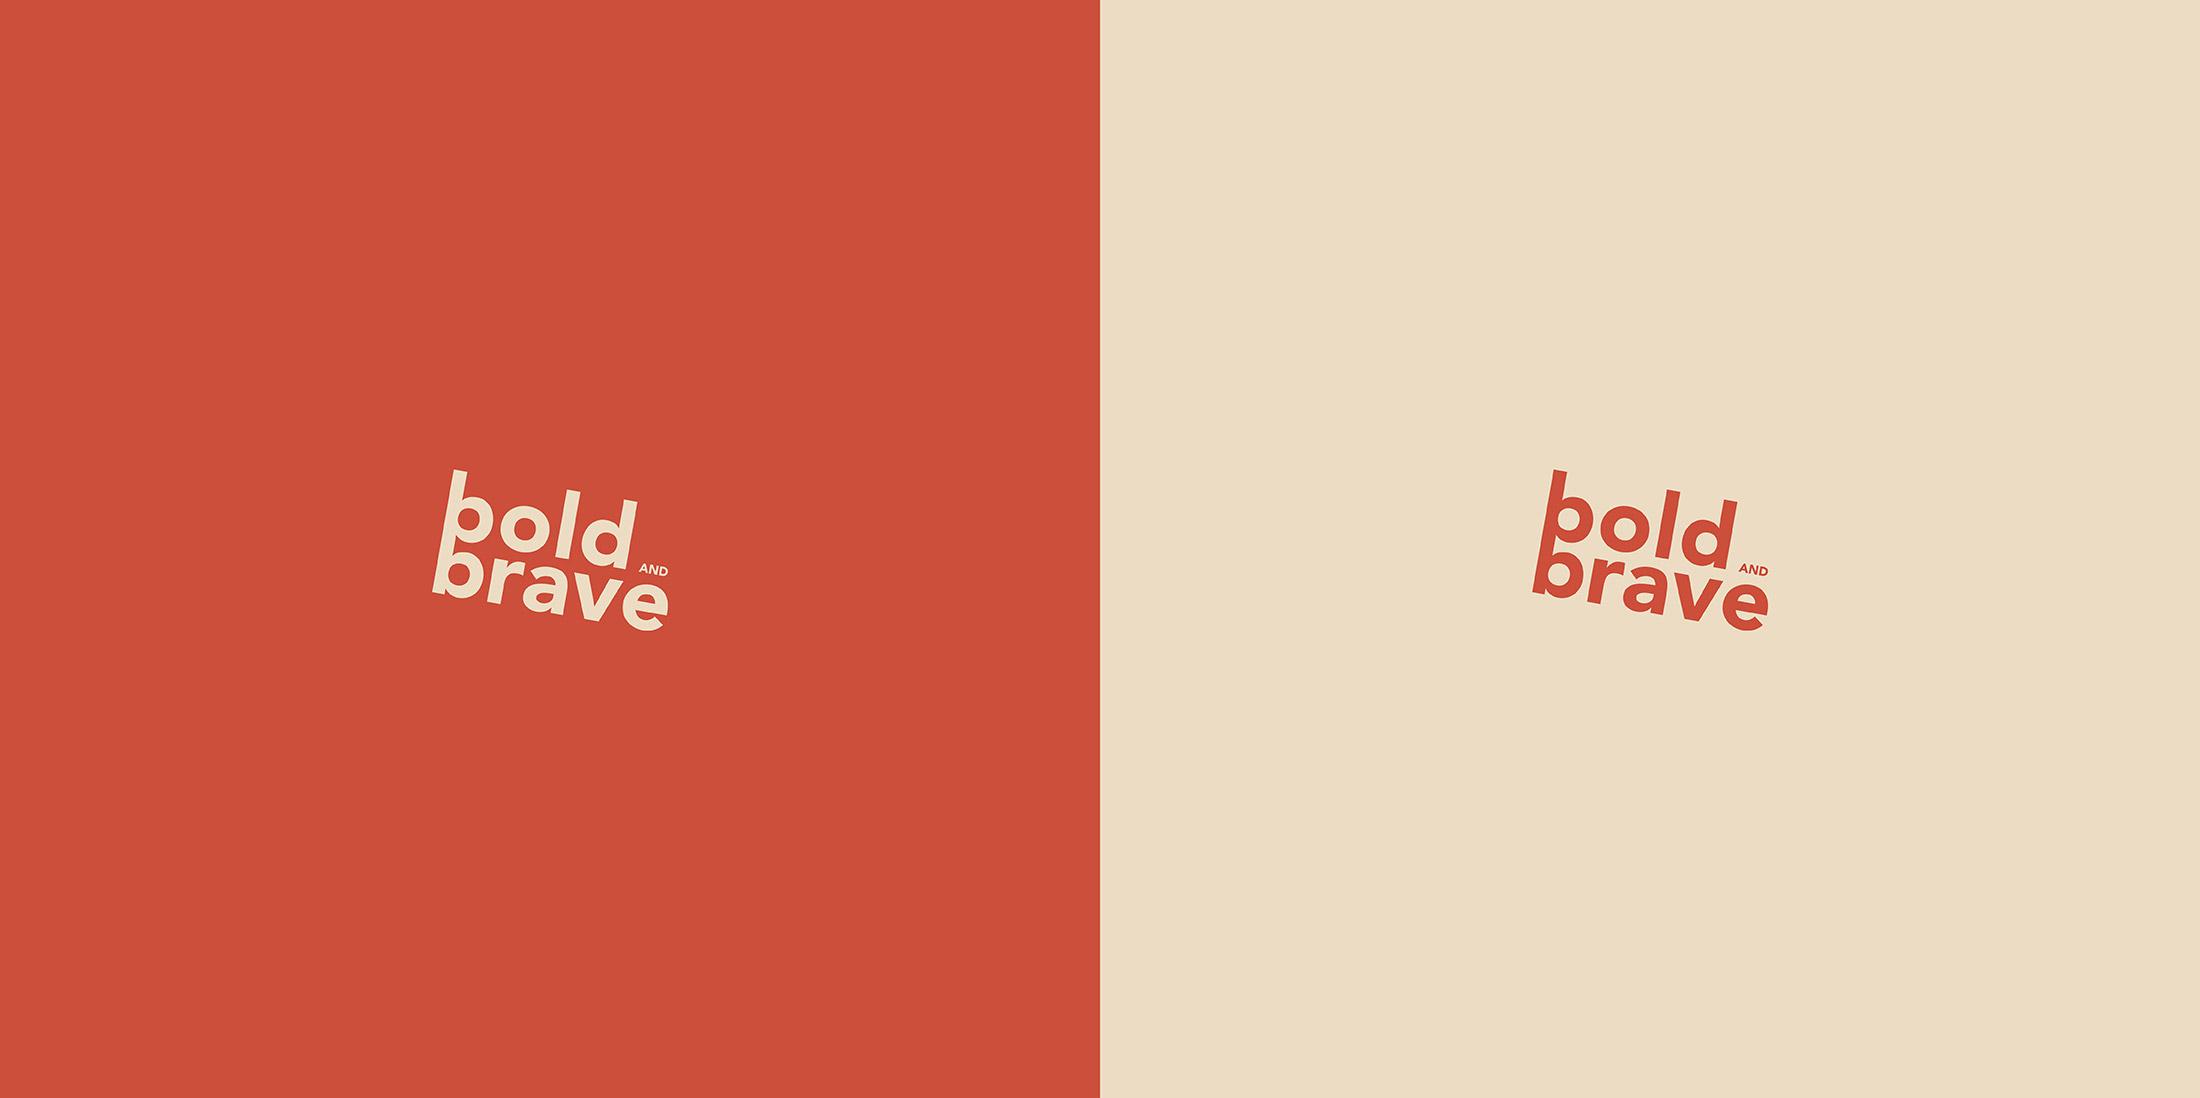 Behance_boldbrave_22